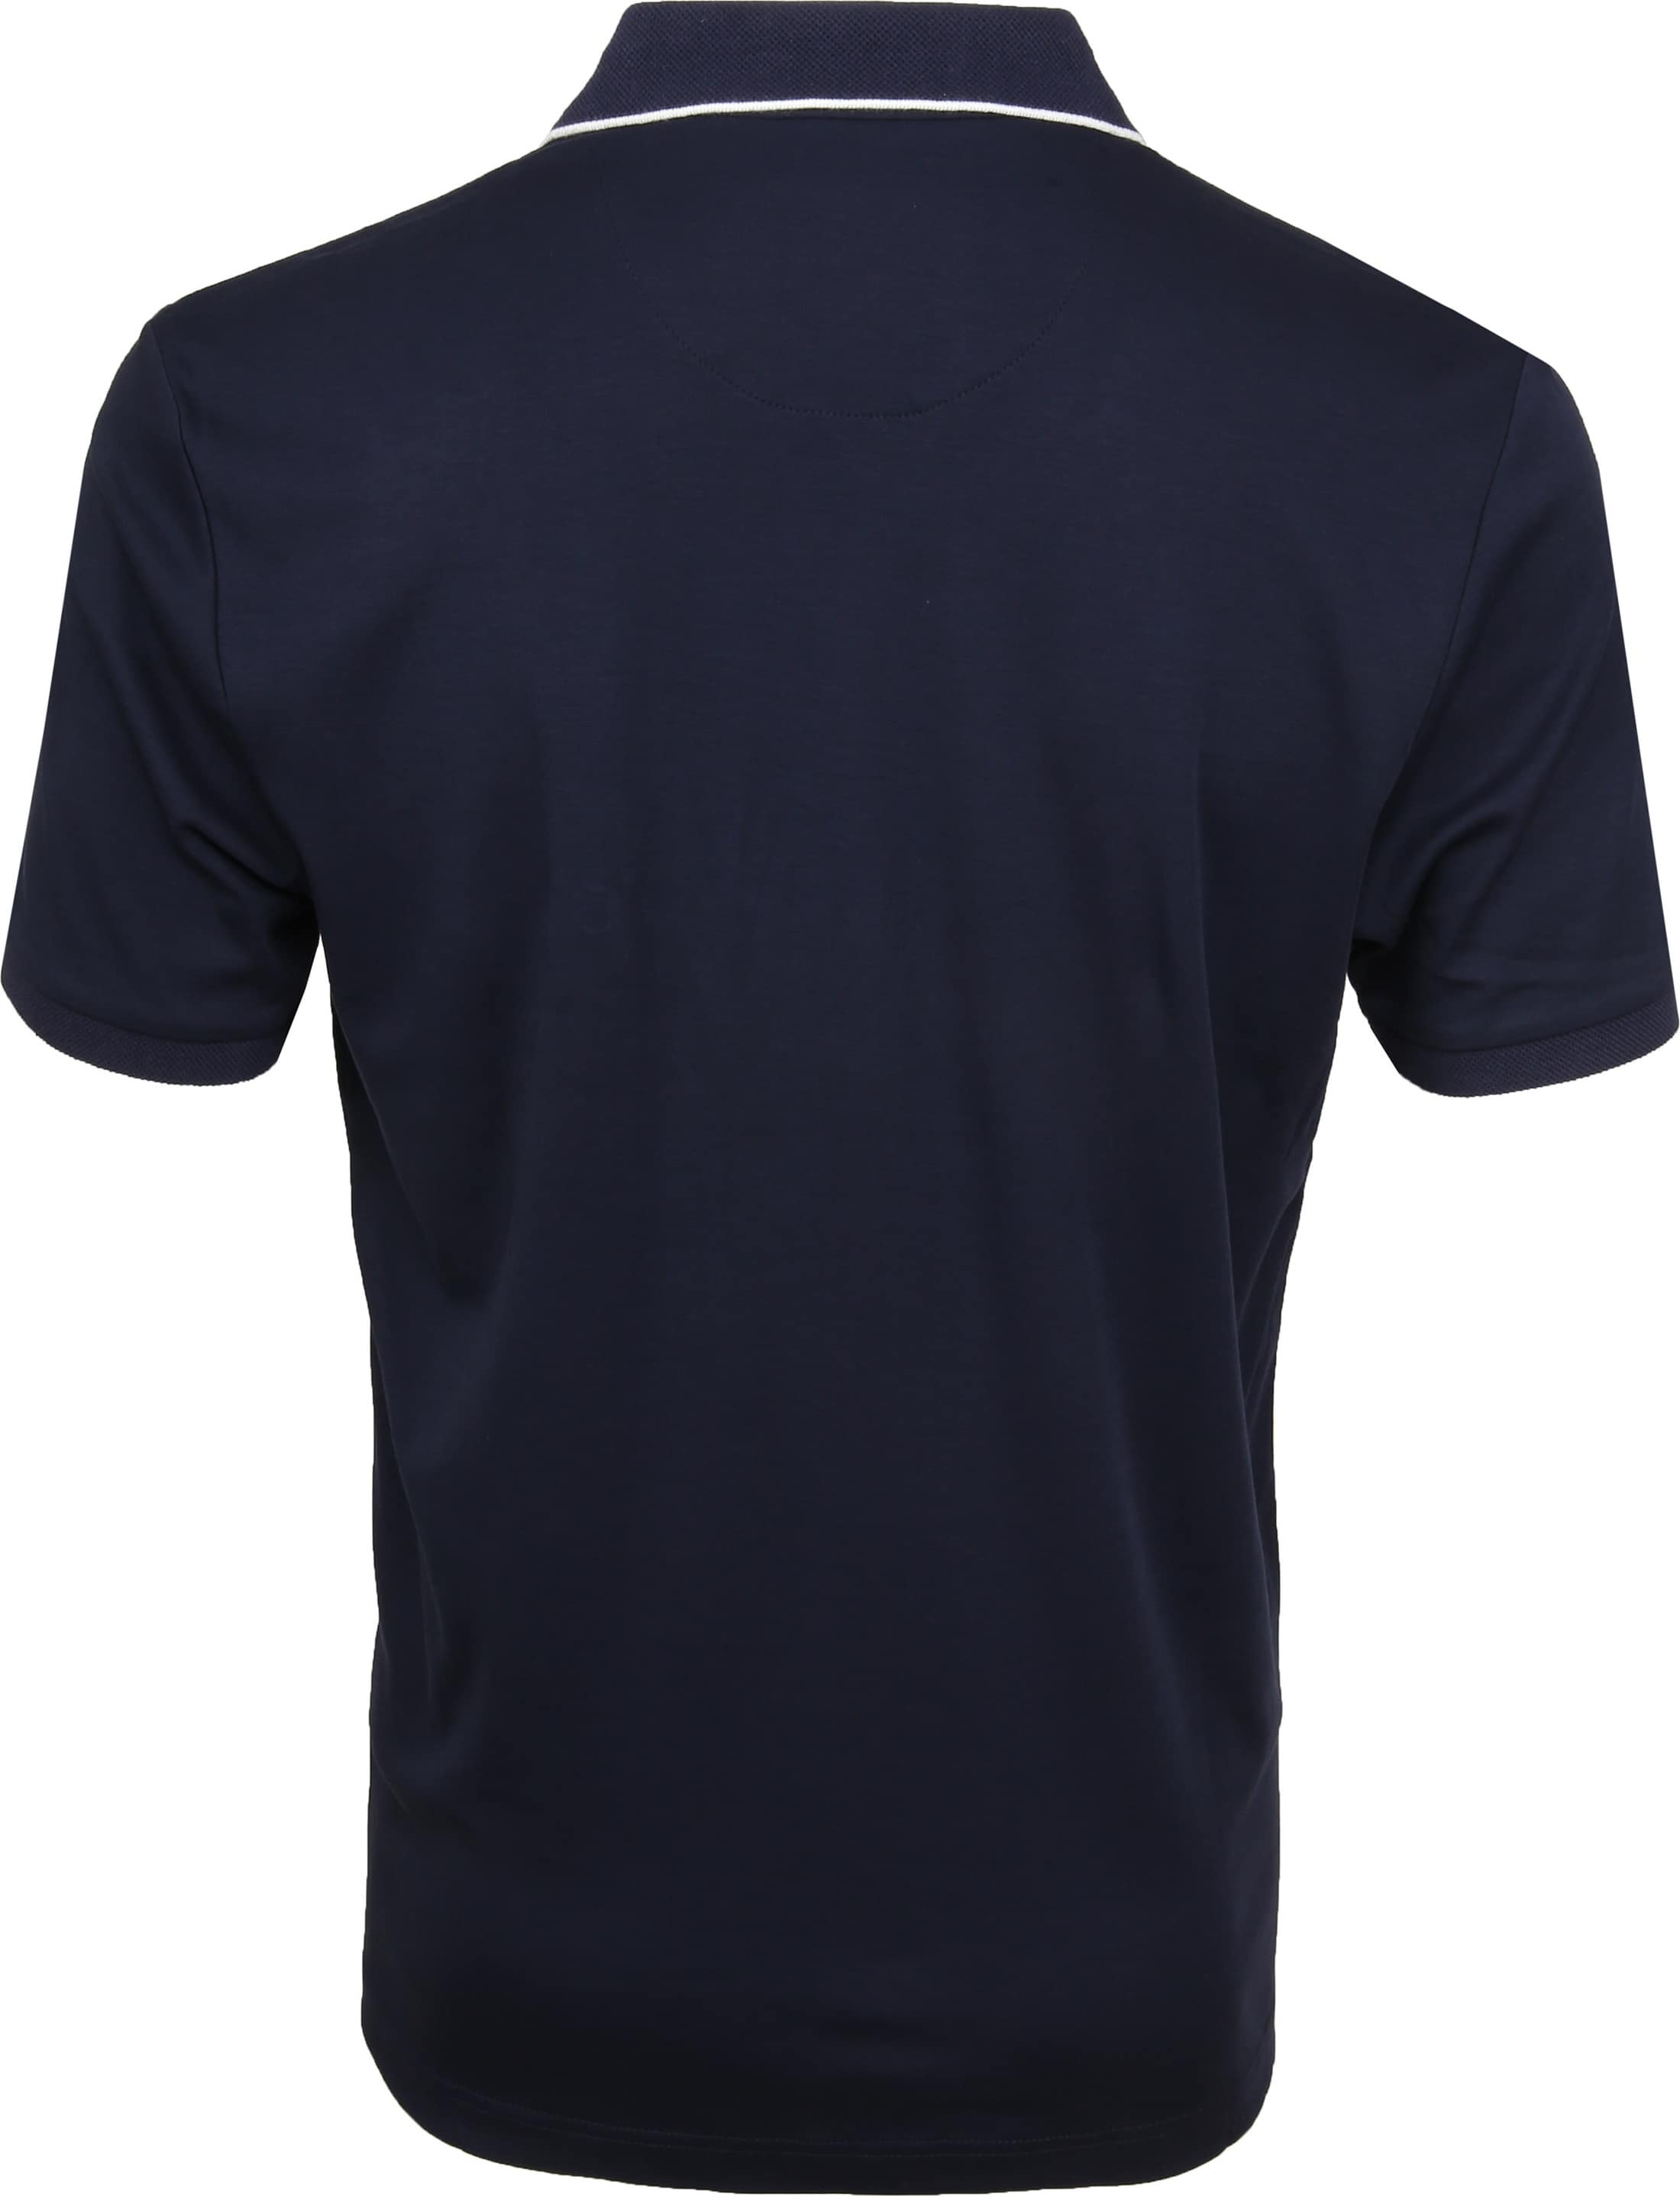 Suitable Liquid Poloshirt Navy foto 3